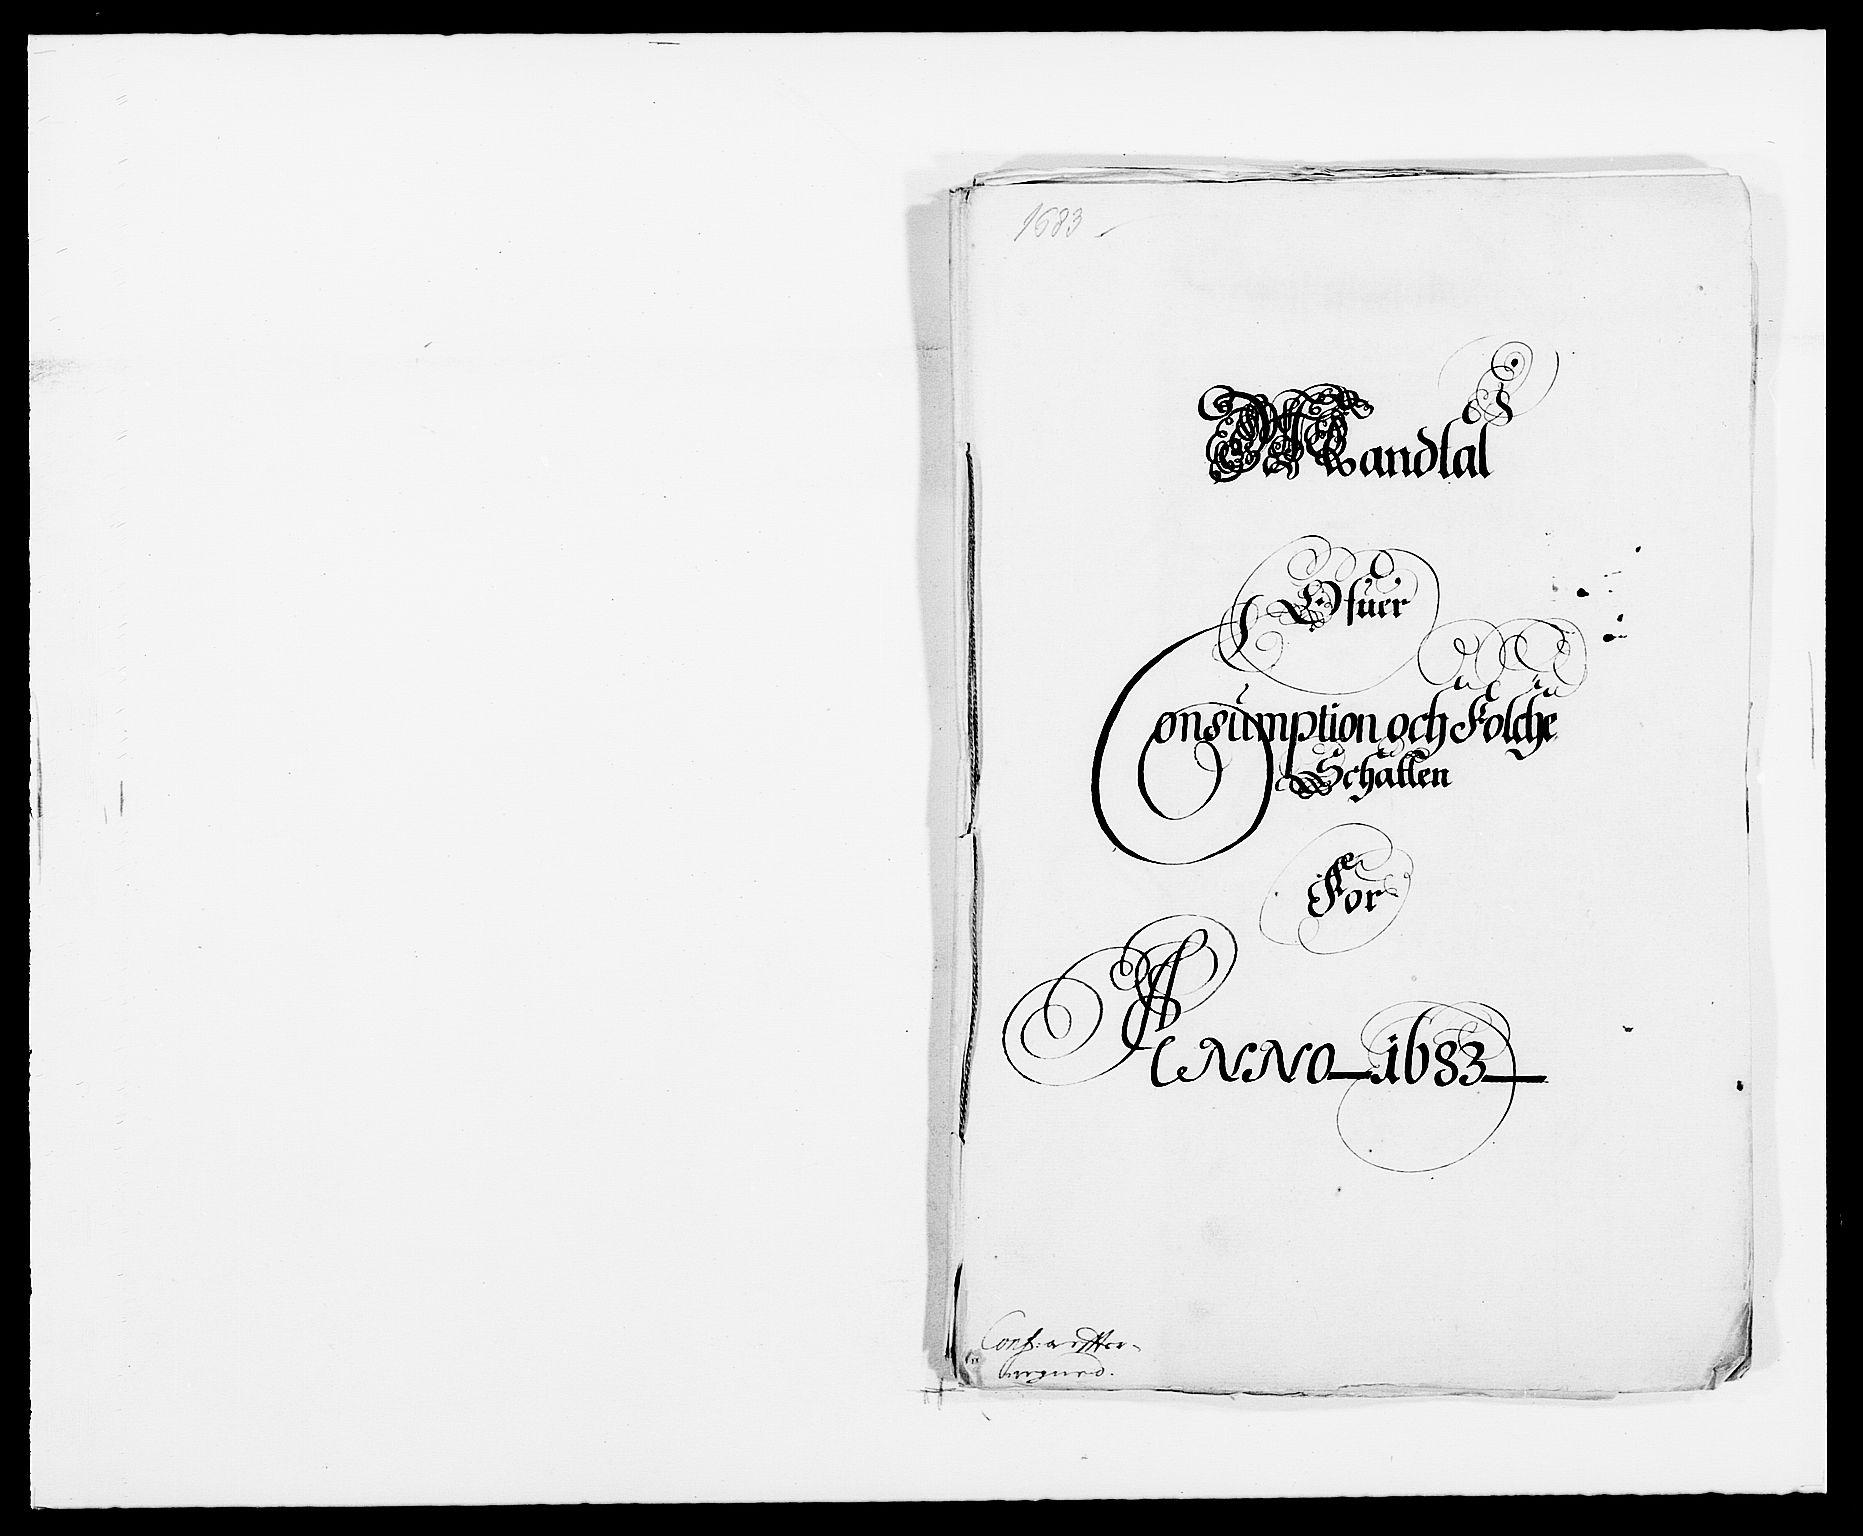 RA, Rentekammeret inntil 1814, Reviderte regnskaper, Fogderegnskap, R32/L1853: Fogderegnskap Jarlsberg grevskap, 1683, s. 129